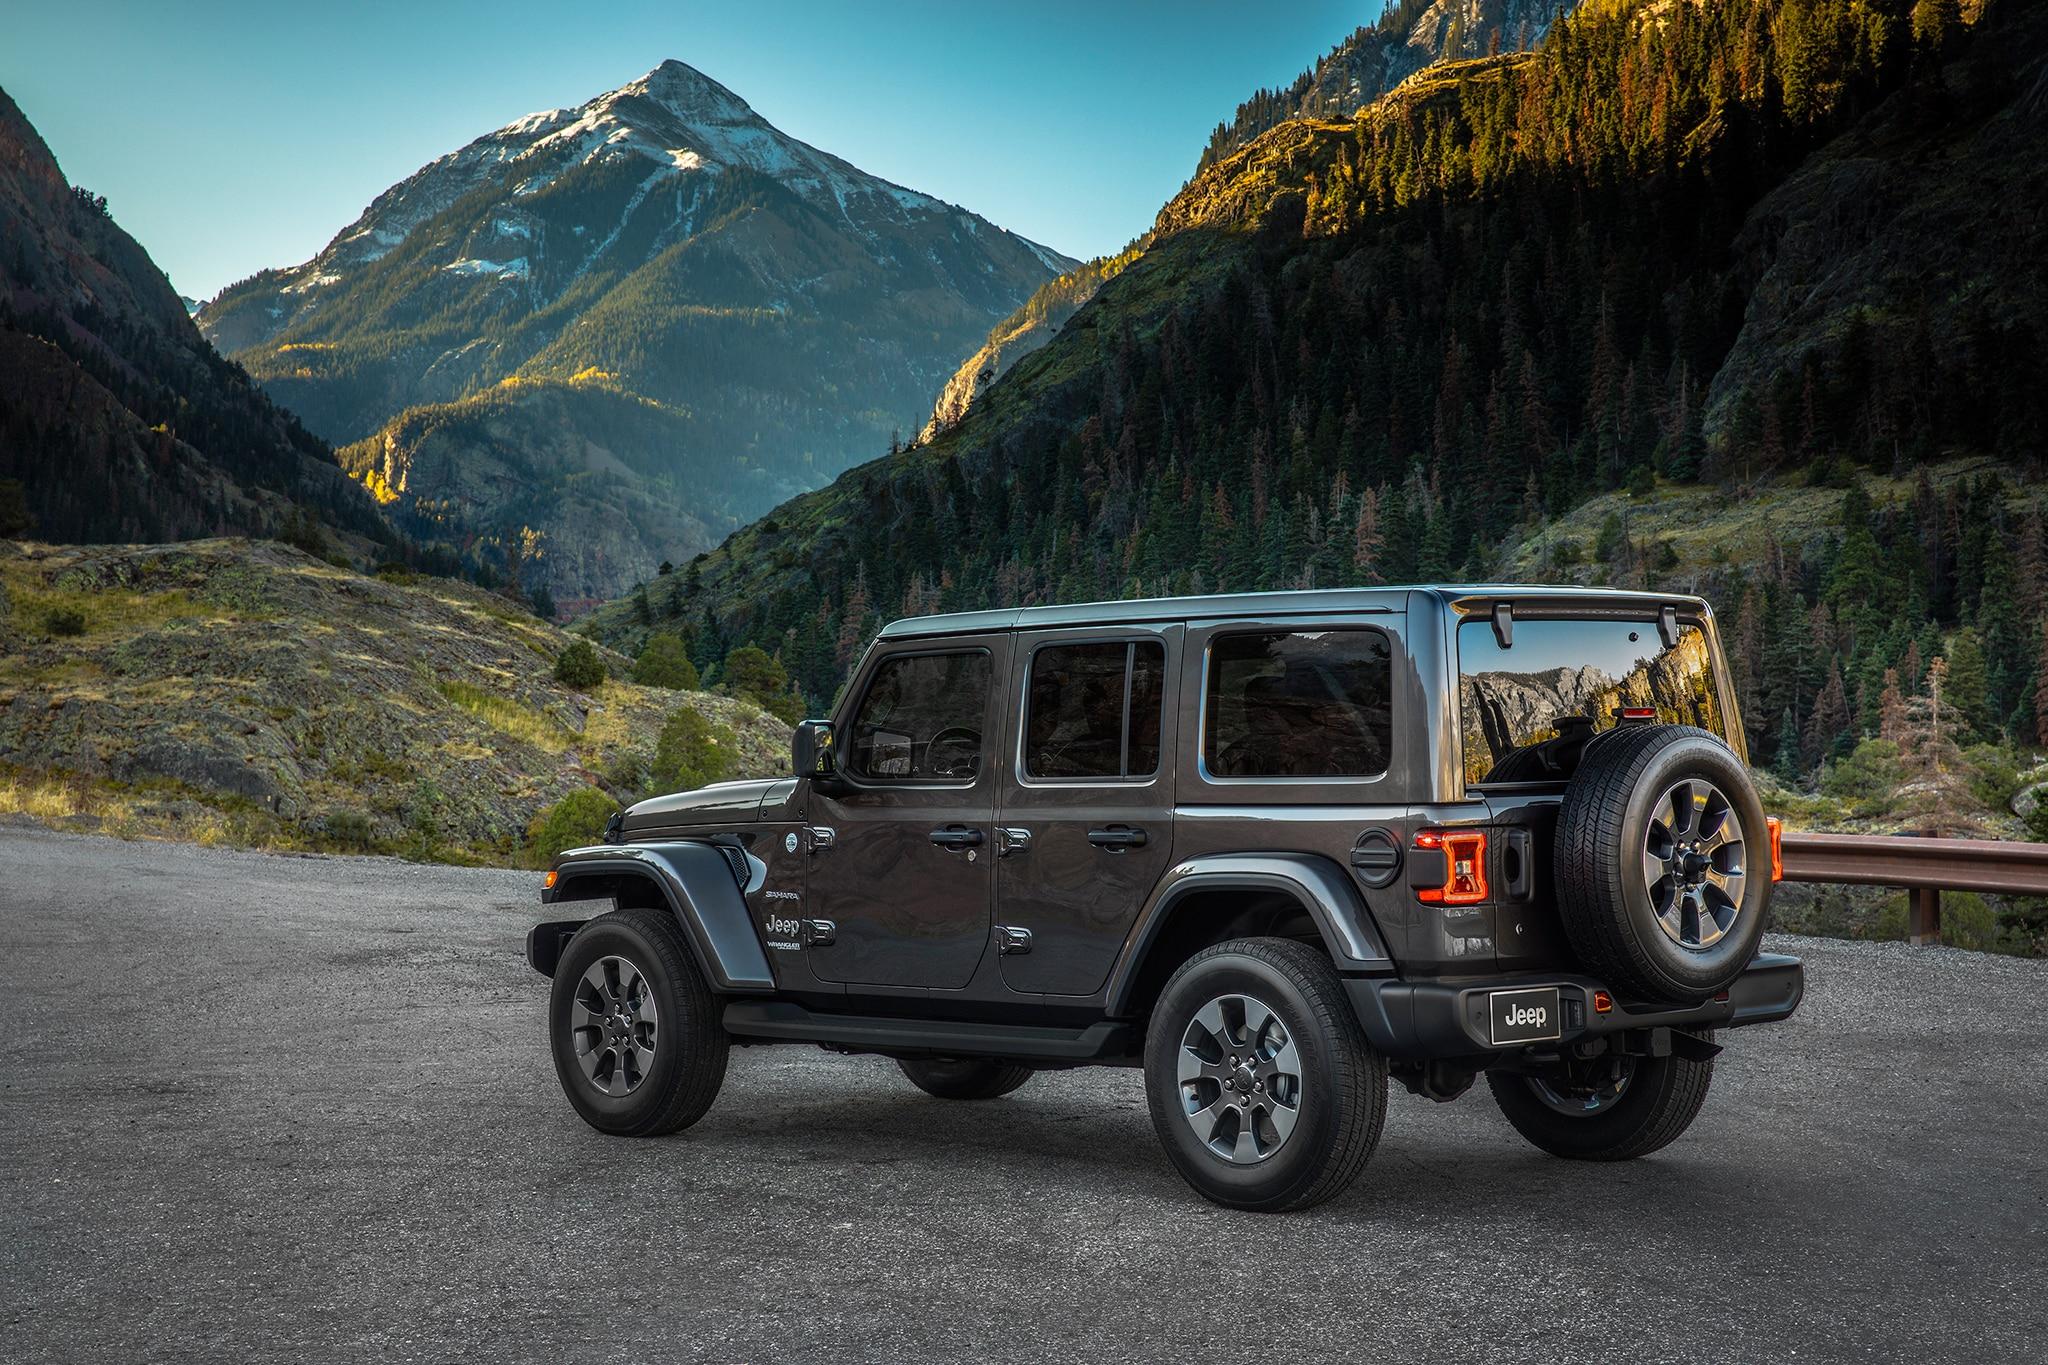 Jeep Sahara 2 Door >> 2018 Jeep Wranger Unlimited Sahara | Automobile Magazine